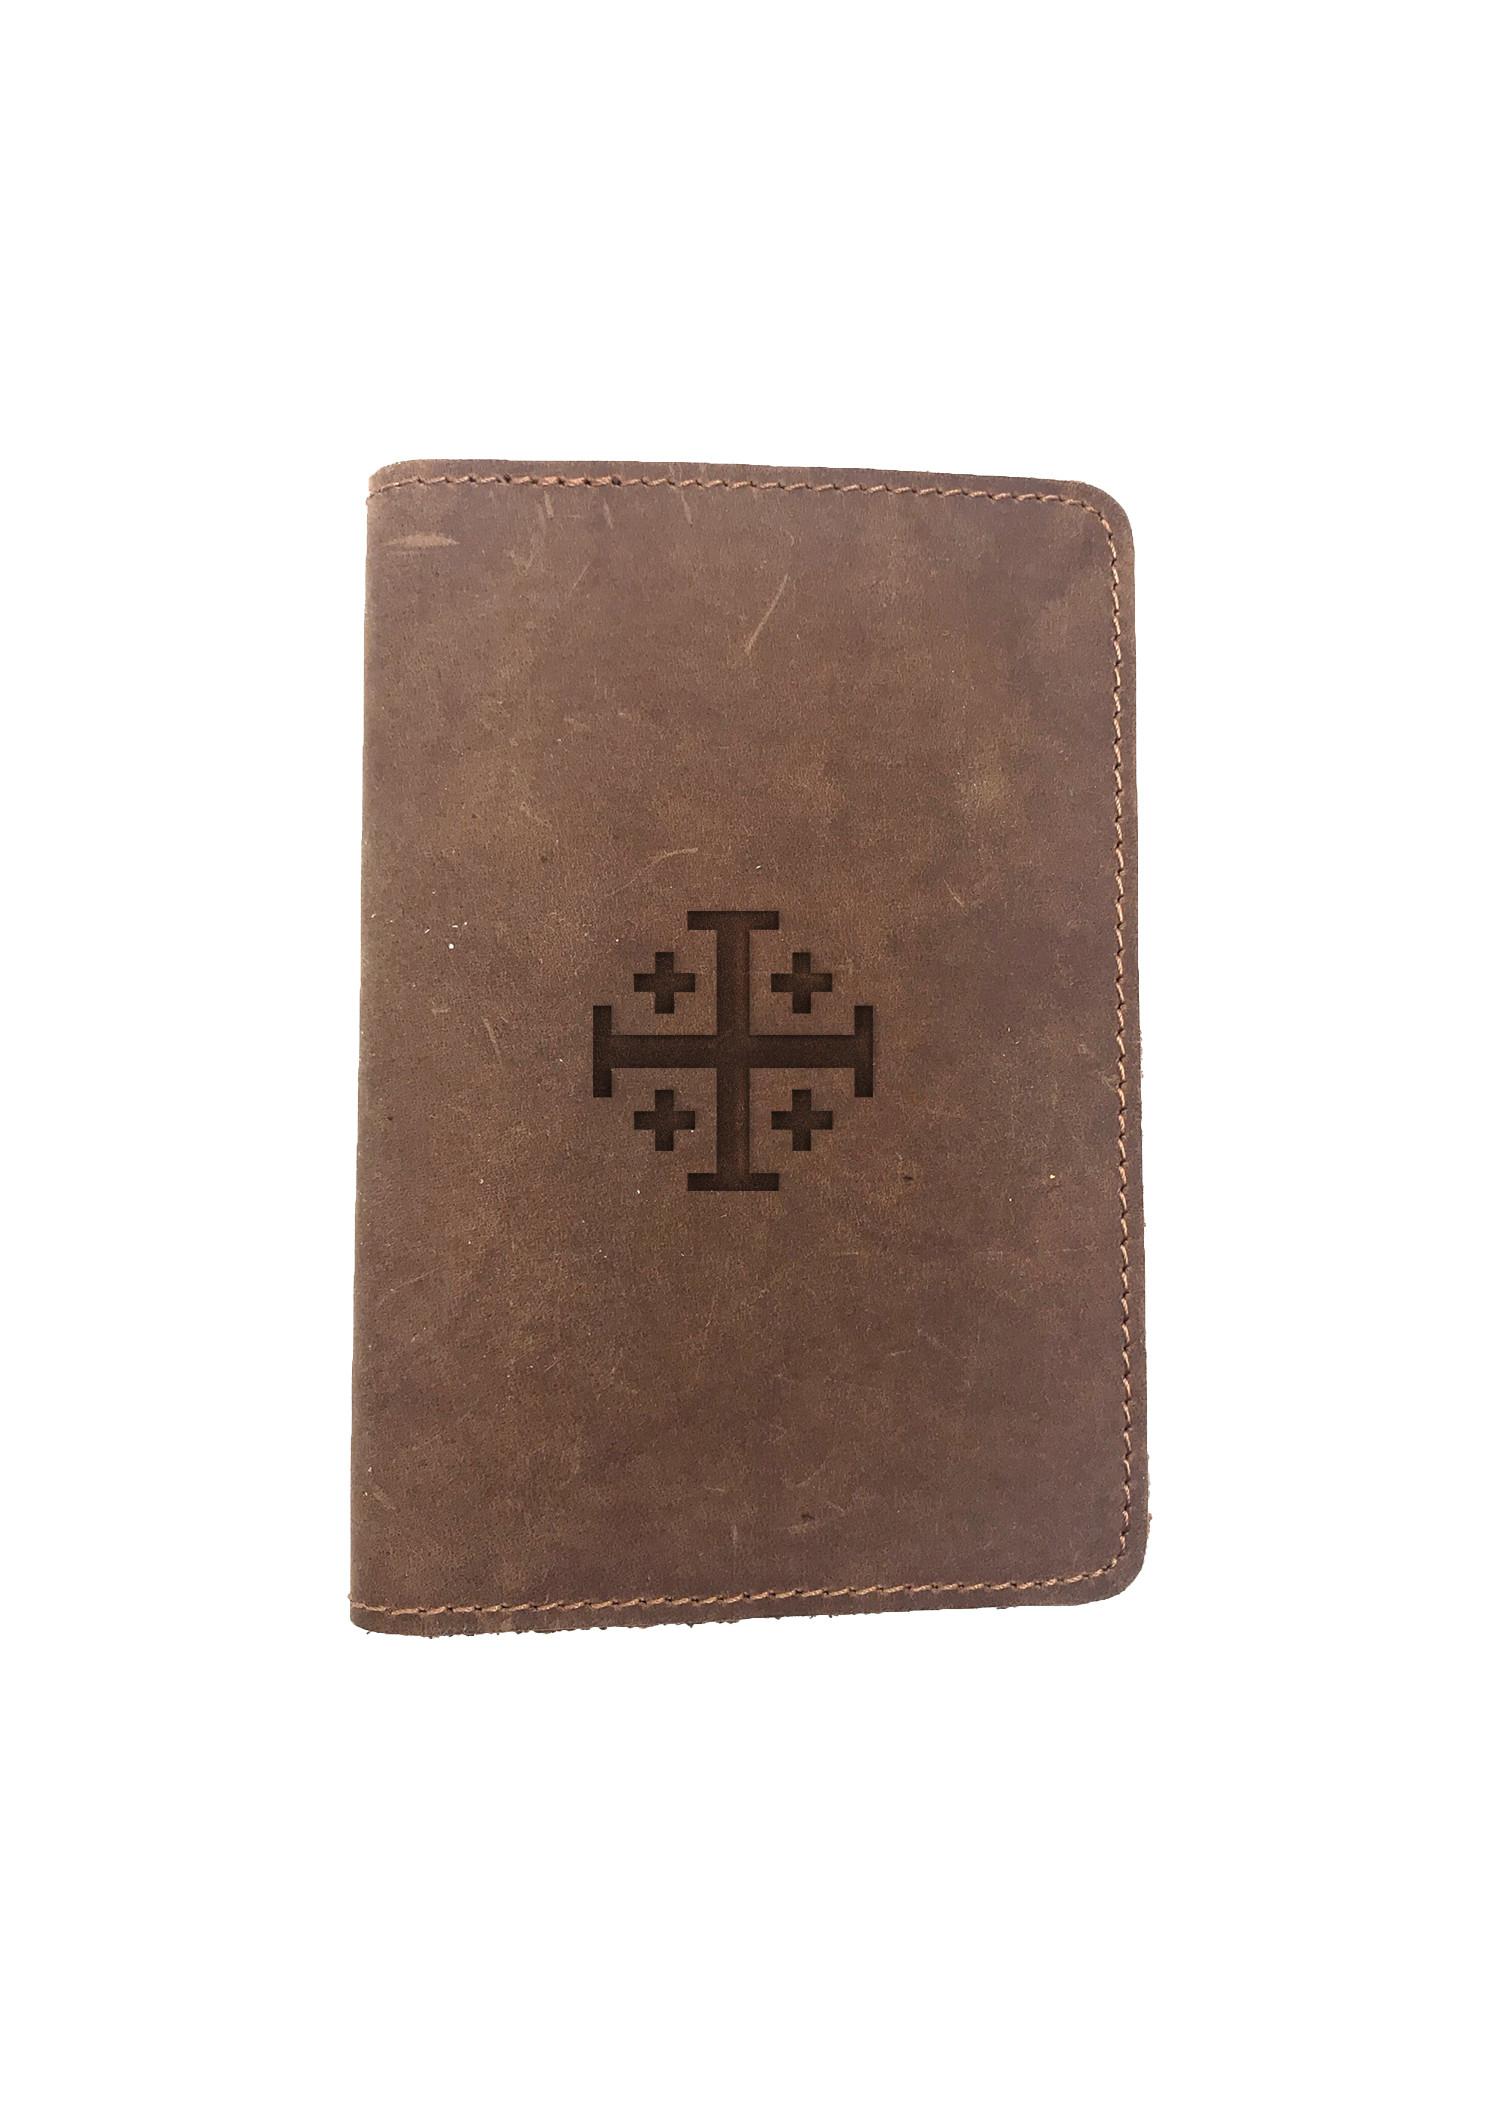 Passport Cover Bao Da Hộ Chiếu Da Sáp Khắc Hình Hình JERUSALEM CROSS (BROWN)